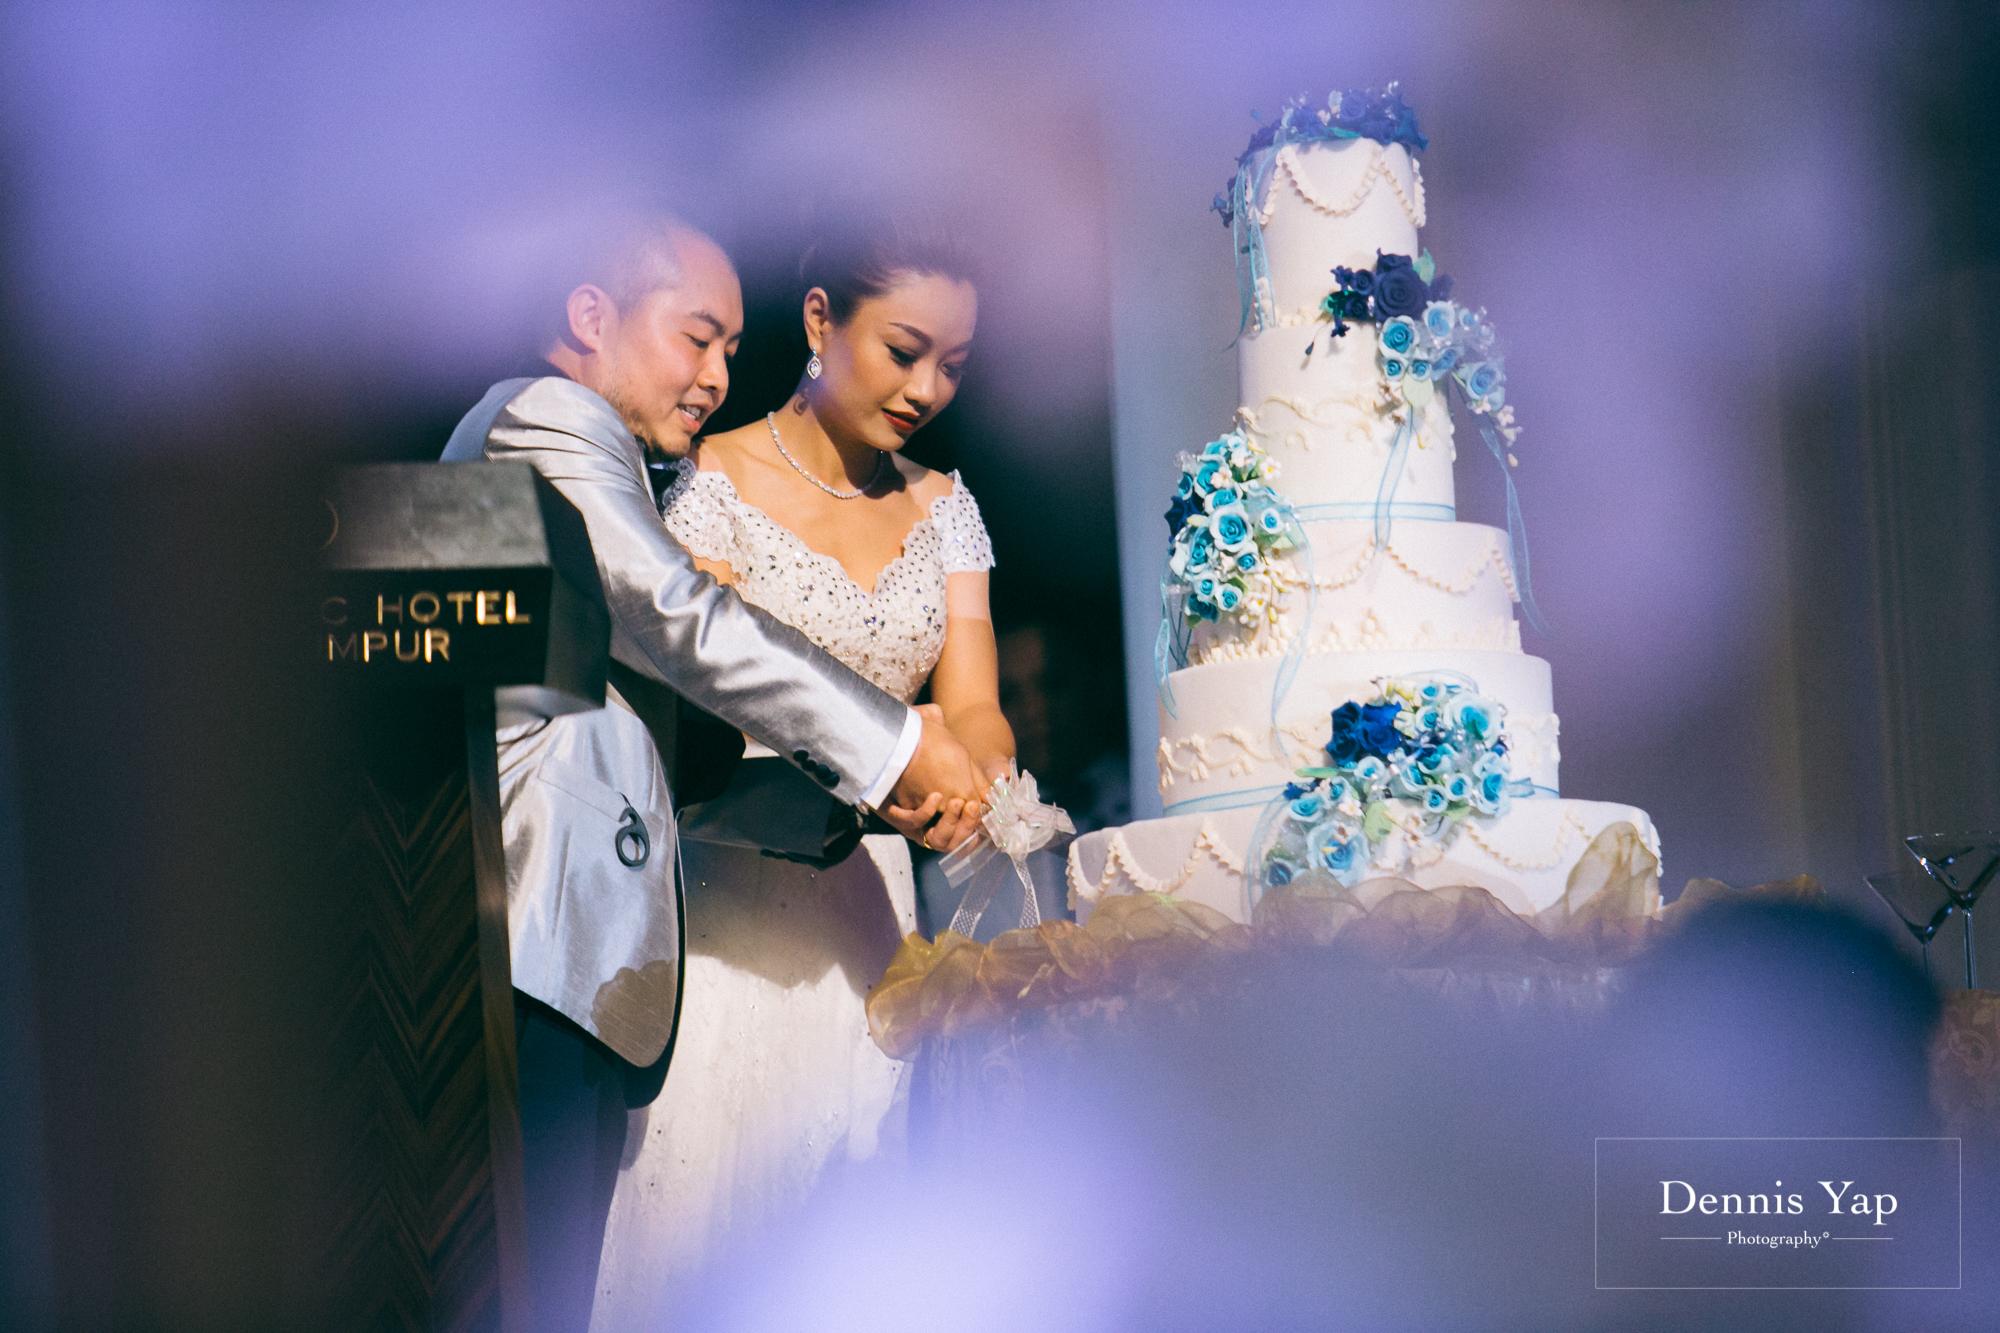 we chard sharon wedding day gate crash majestic hotel kuala lumpur moonlight dennis yap photography malaysia-43.jpg